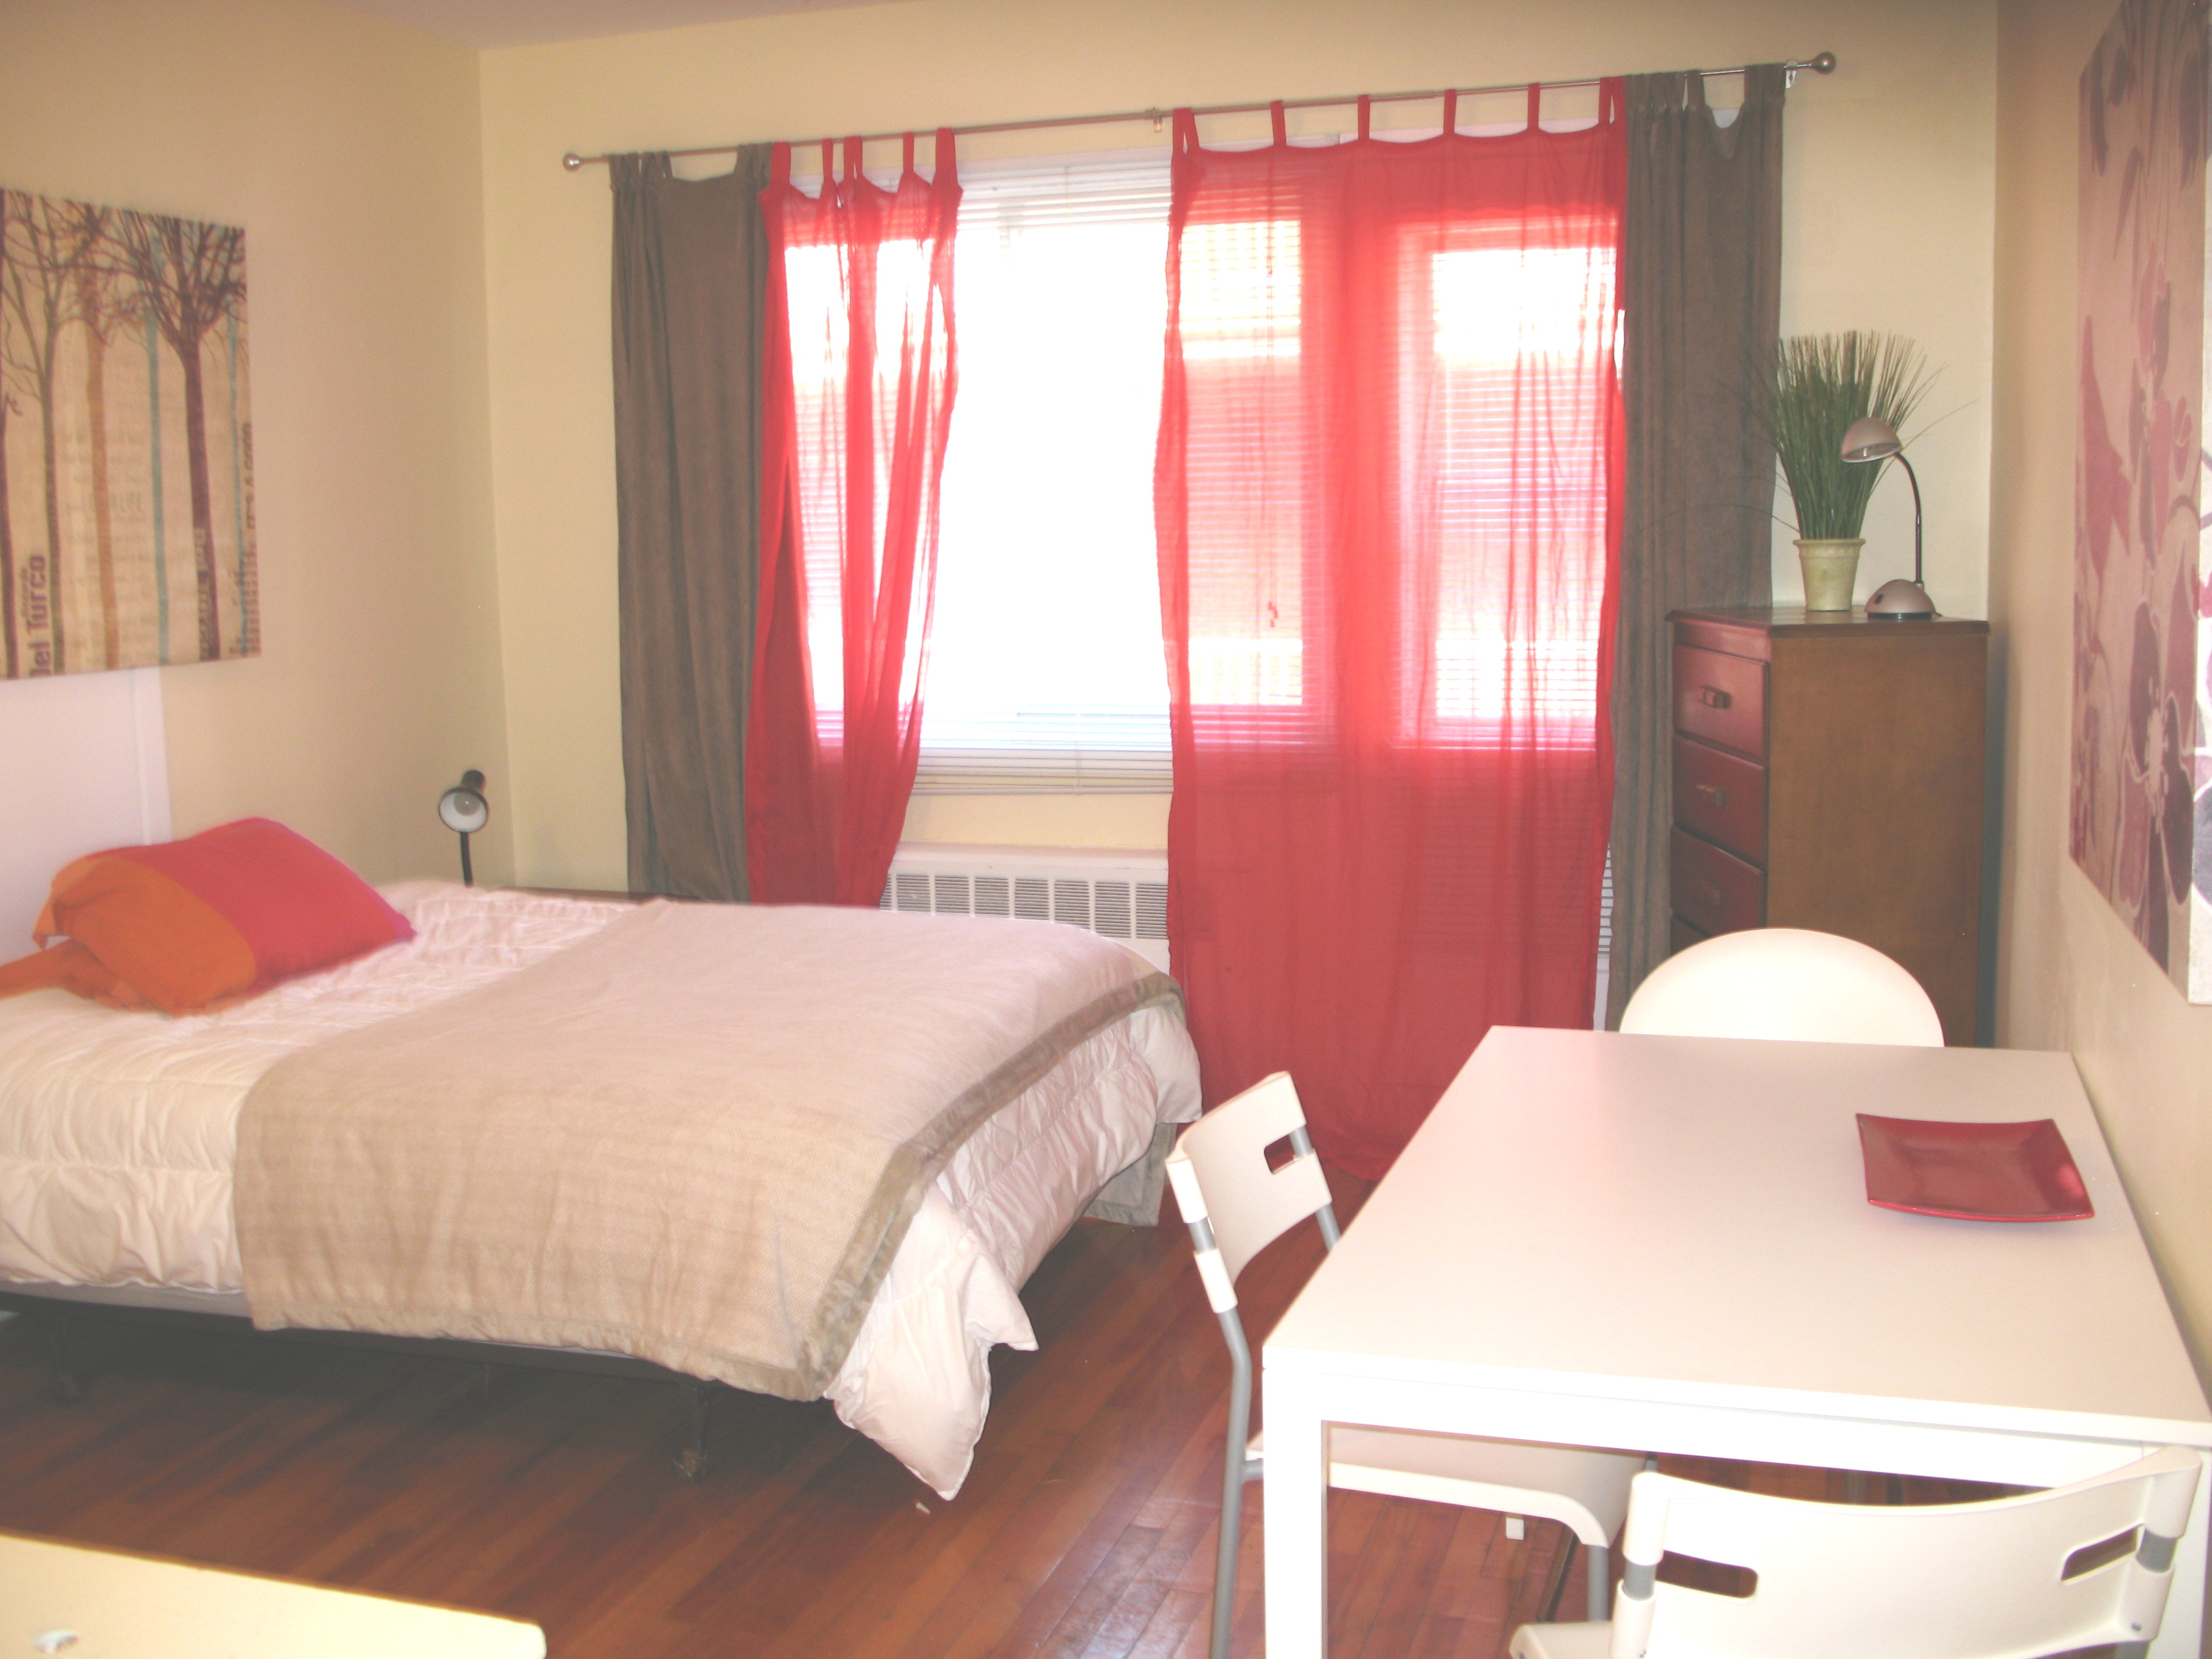 Studio / Bachelor Apartments for rent in Cote-des-Neiges at CDN - Photo 06 - RentQuebecApartments – L8140